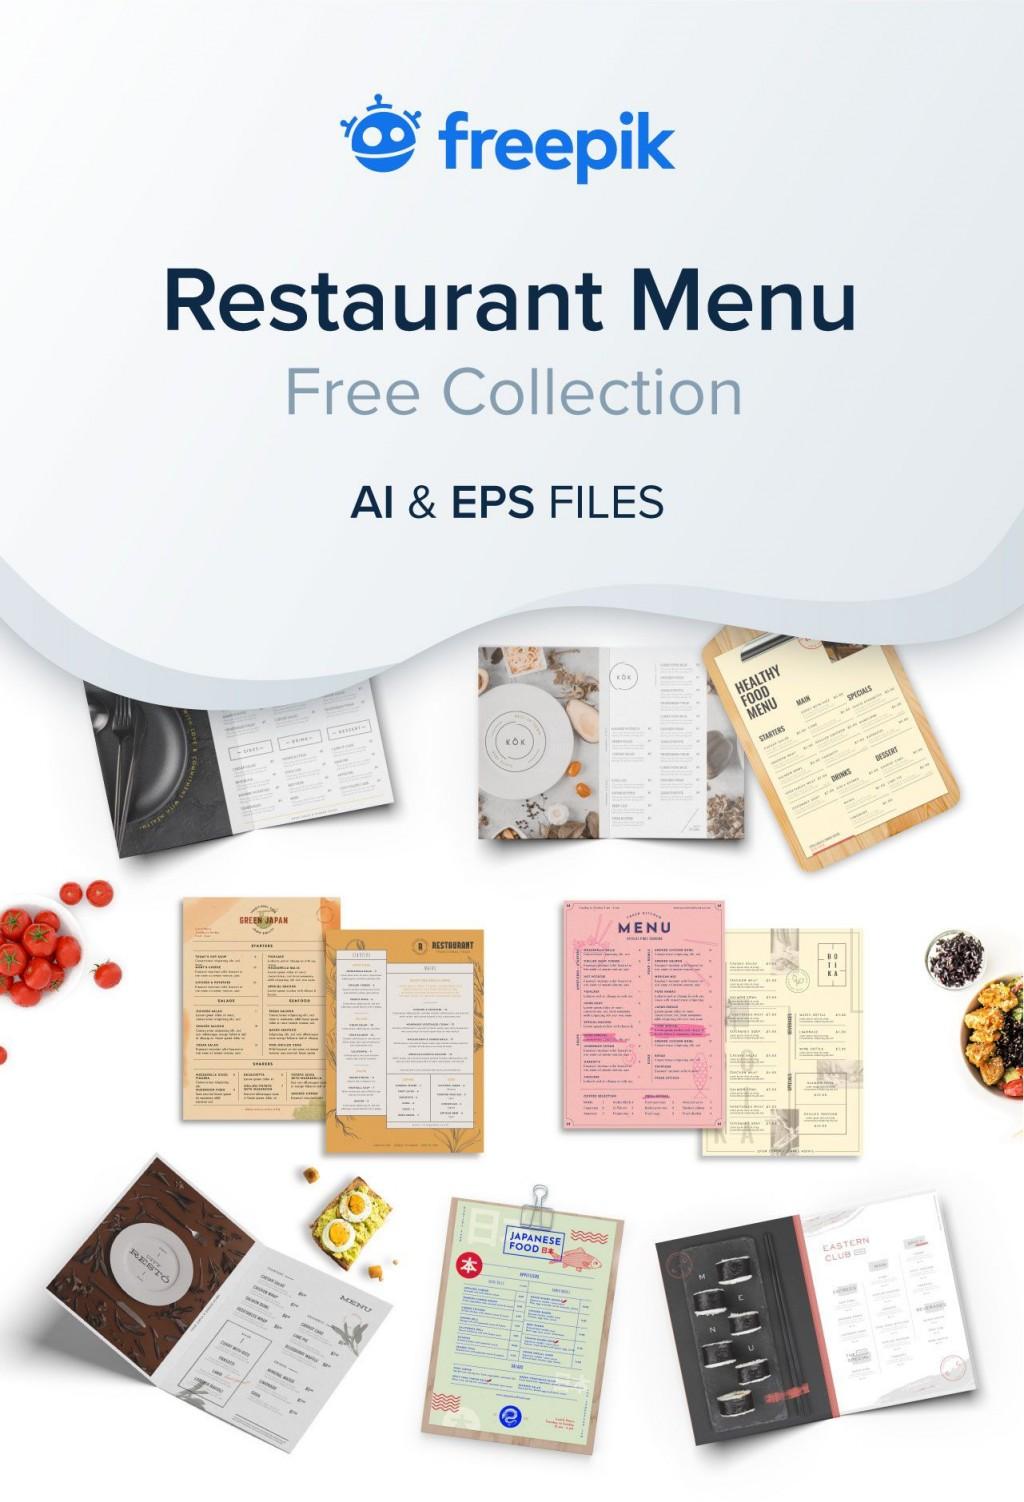 007 Outstanding Free Menu Template Download Example  Beauty Parlour Card Html Design RestaurantLarge